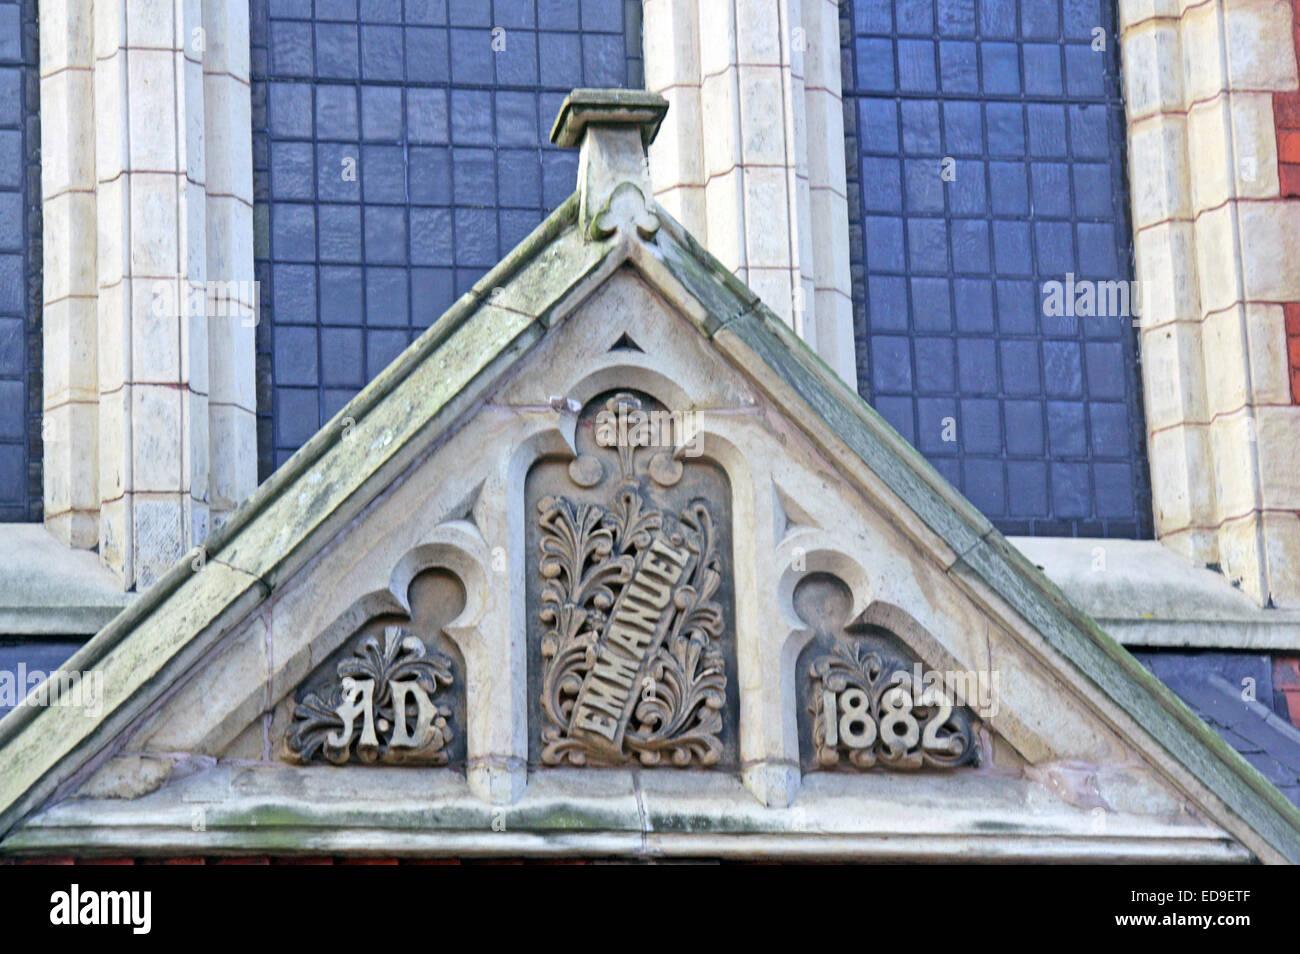 Laden Sie dieses Alamy Stockfoto Emmanuel Kirchgemeindehaus Fett AD 1882 St Warrington, Cheshire, England, UK - ED9ETF